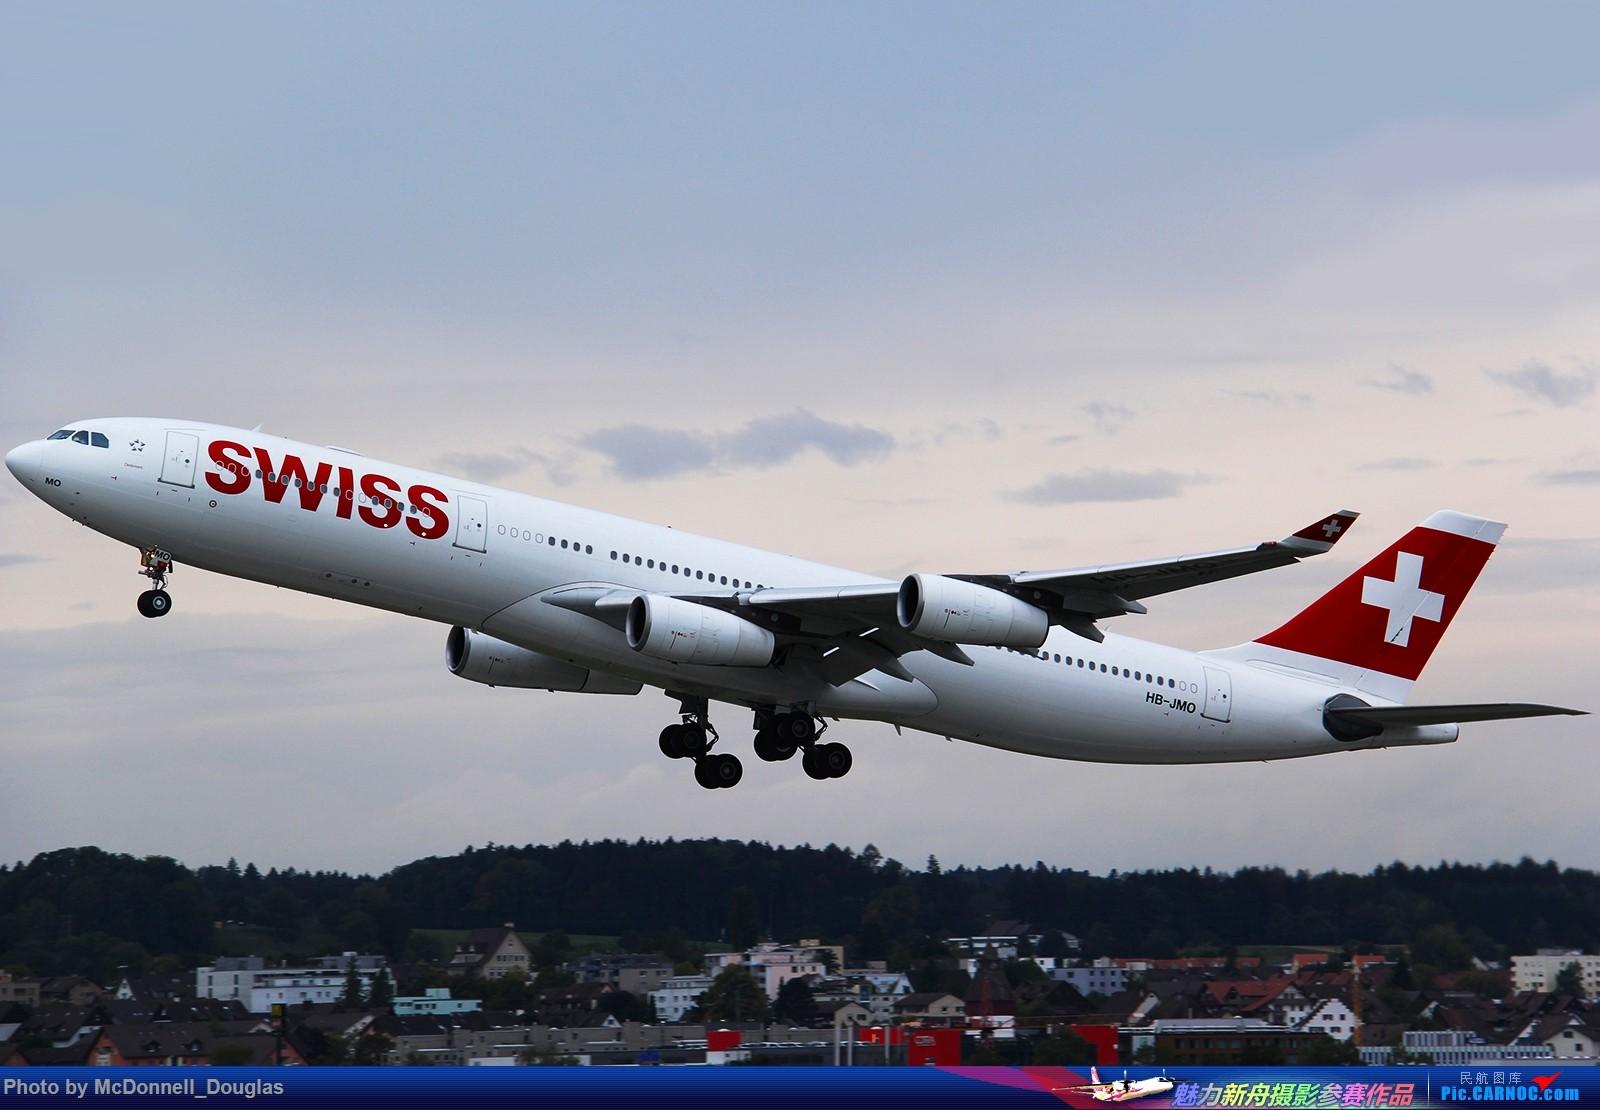 Re:[原创]【上海飞友会】一图 Swissair的5apu @LSZH AIRBUS A340-313X HB-JMO 瑞士苏黎世机场